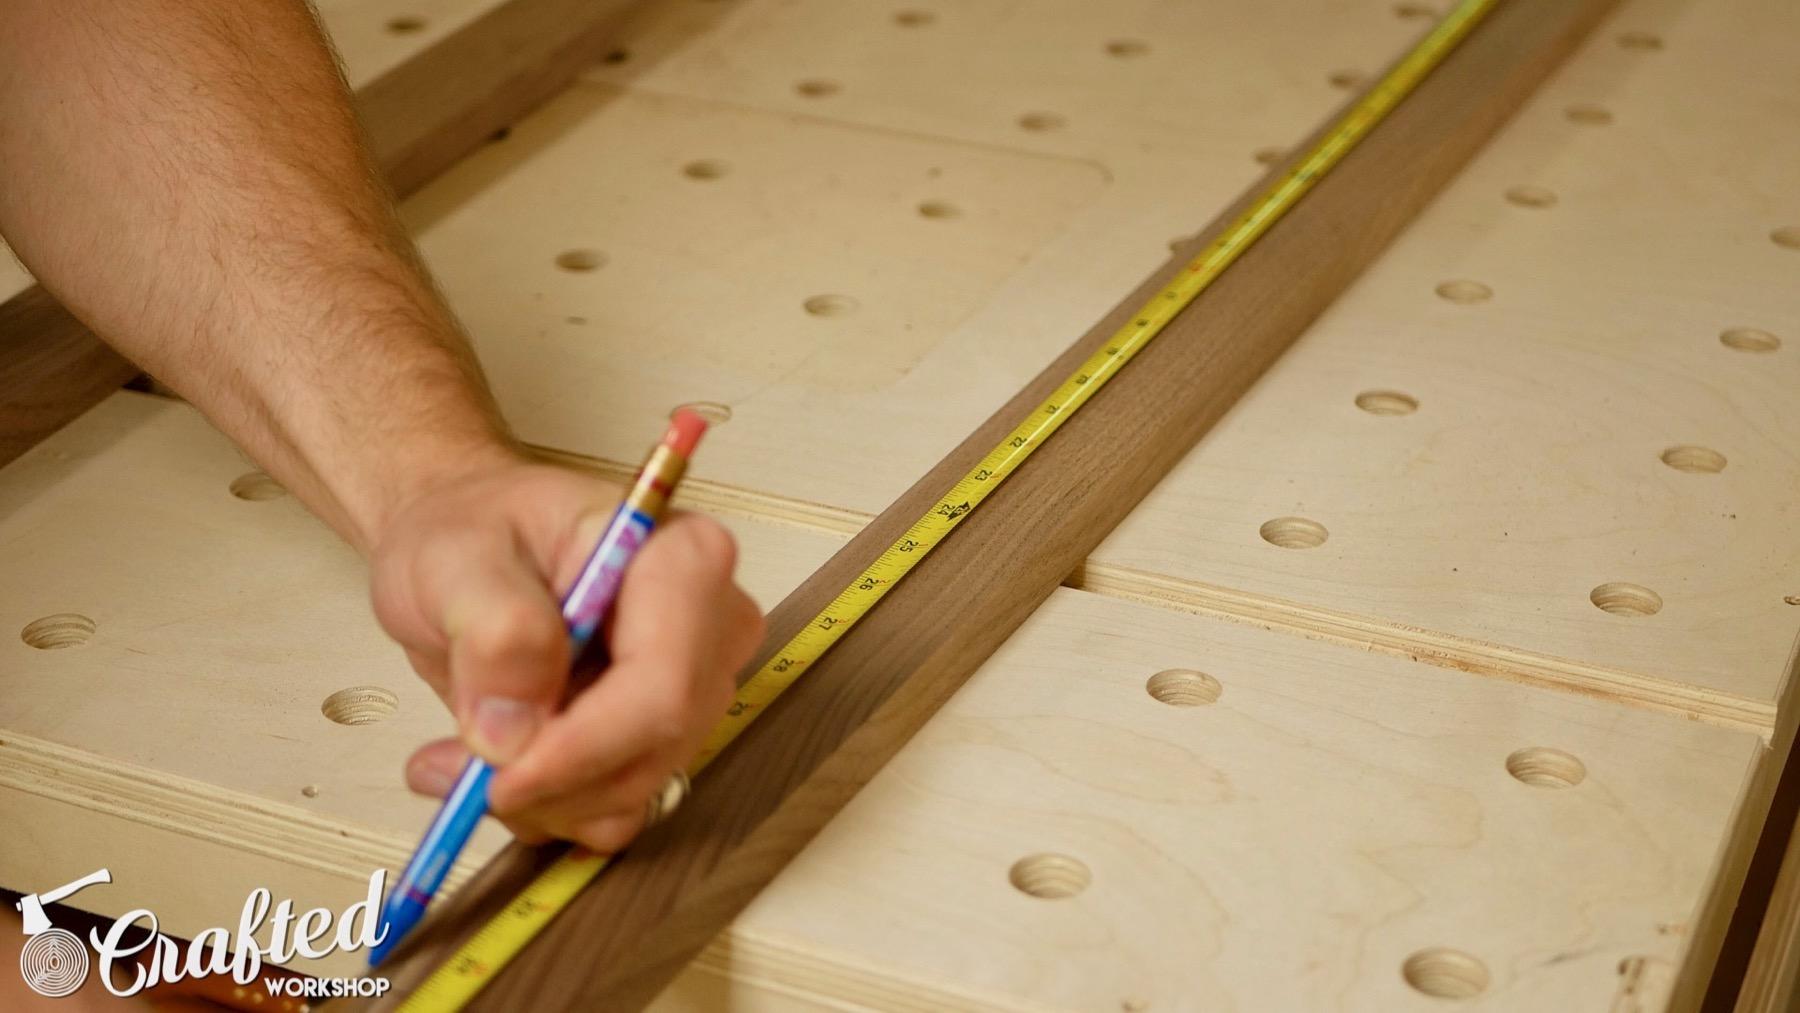 DIY Light Box Sign How-To Build walnut paulk workbench